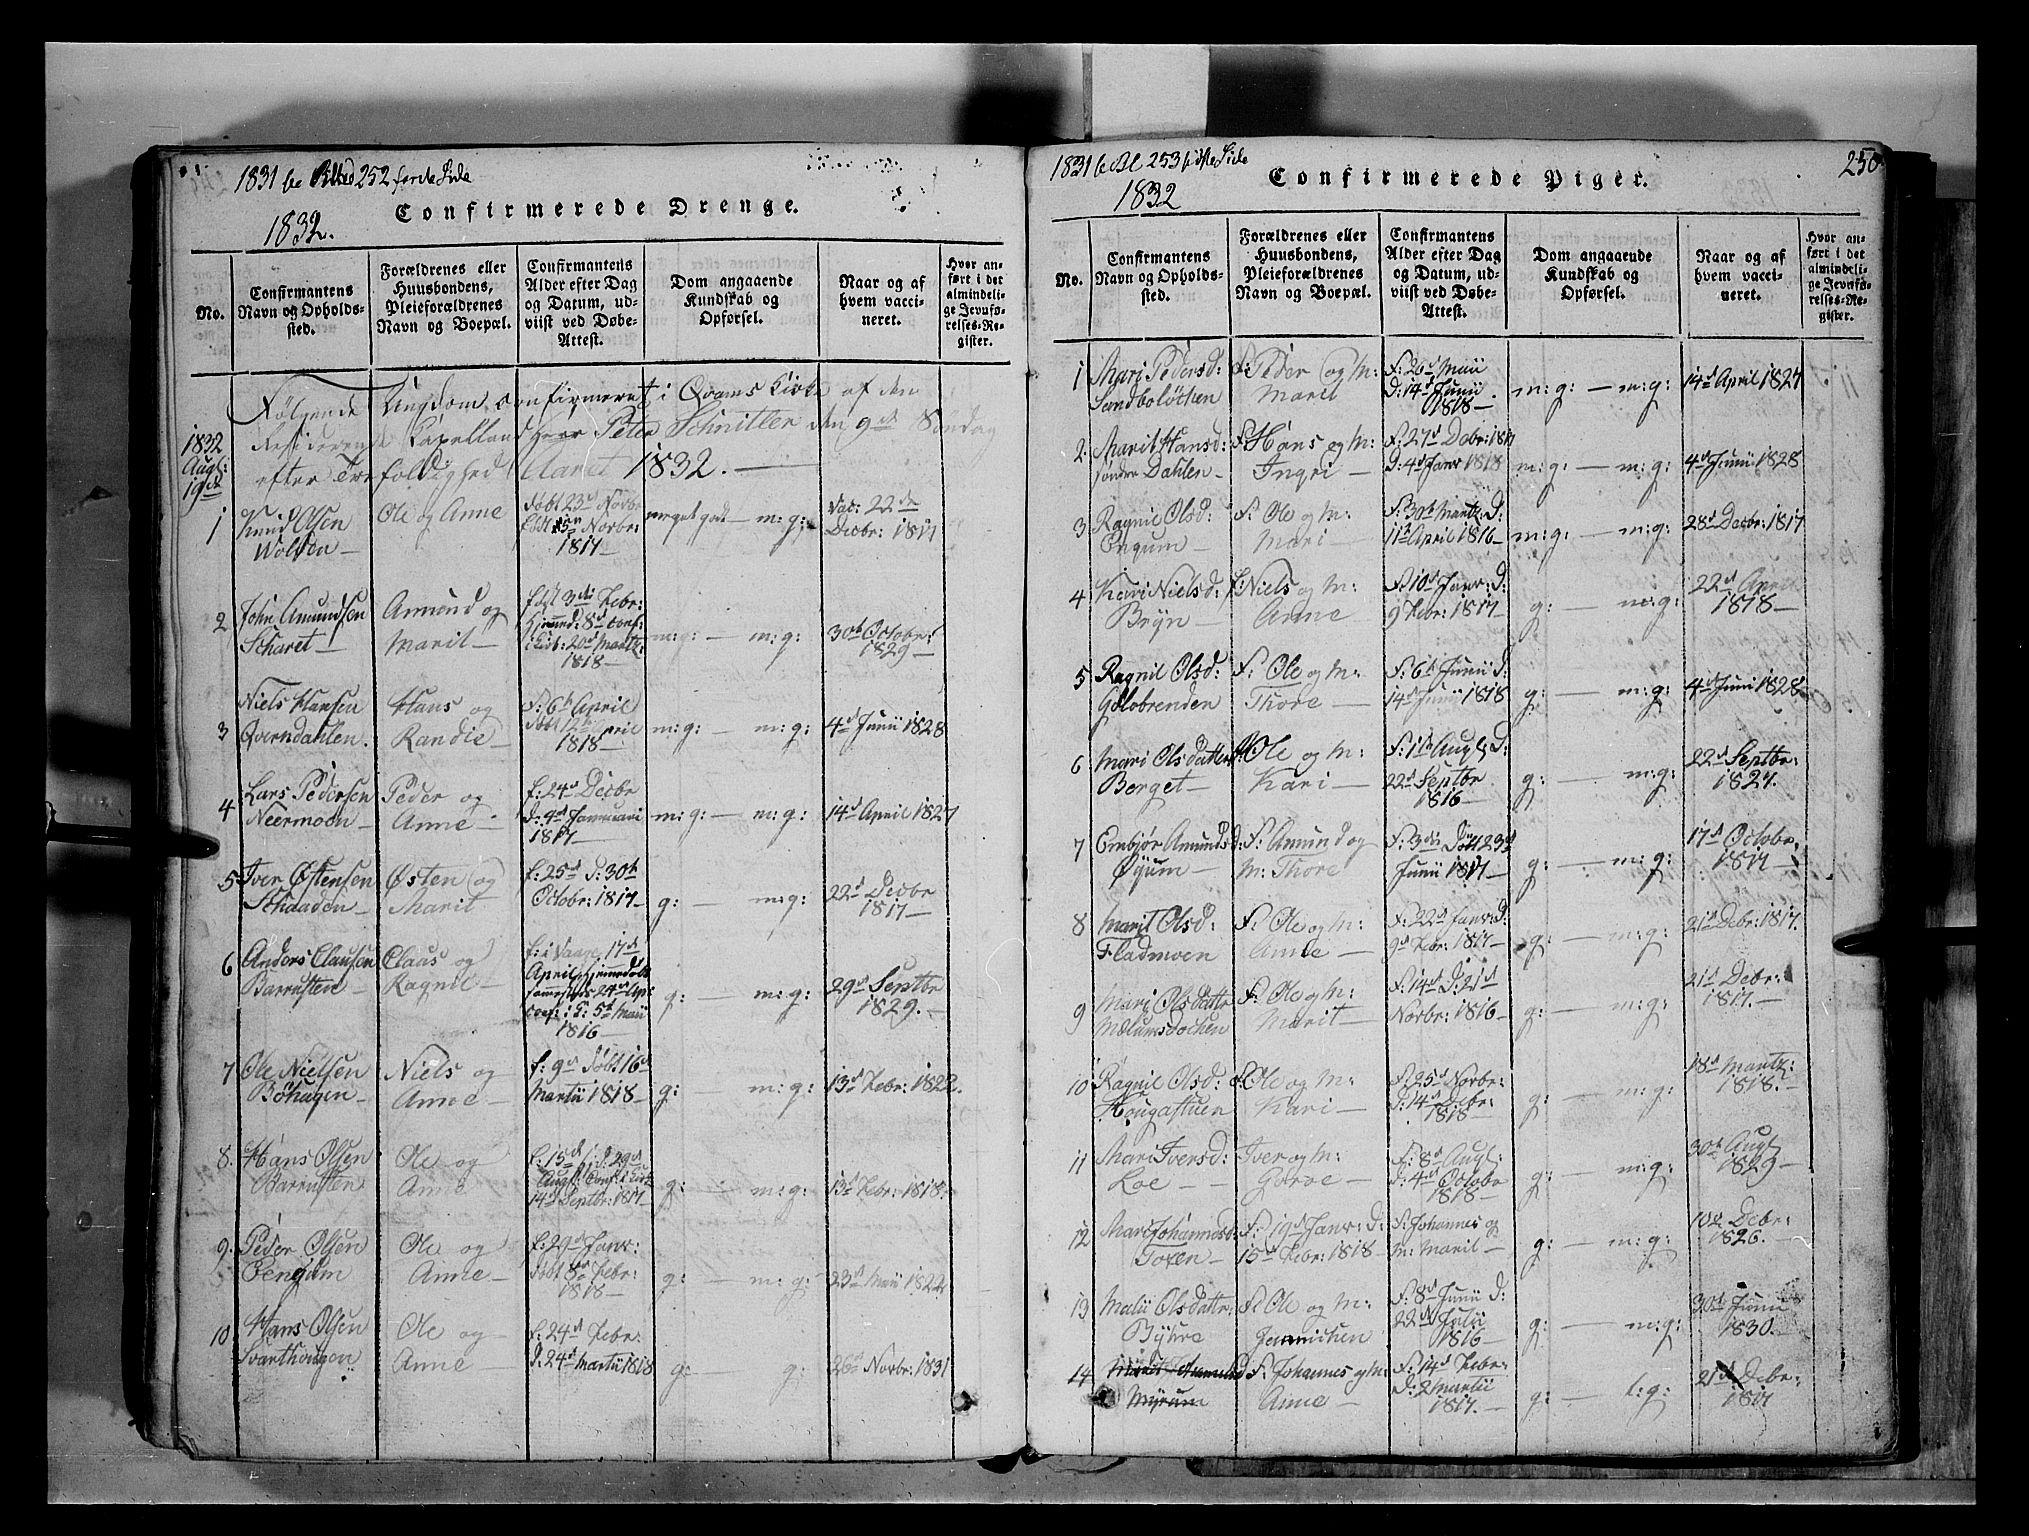 SAH, Fron prestekontor, H/Ha/Hab/L0004: Klokkerbok nr. 4, 1816-1850, s. 250